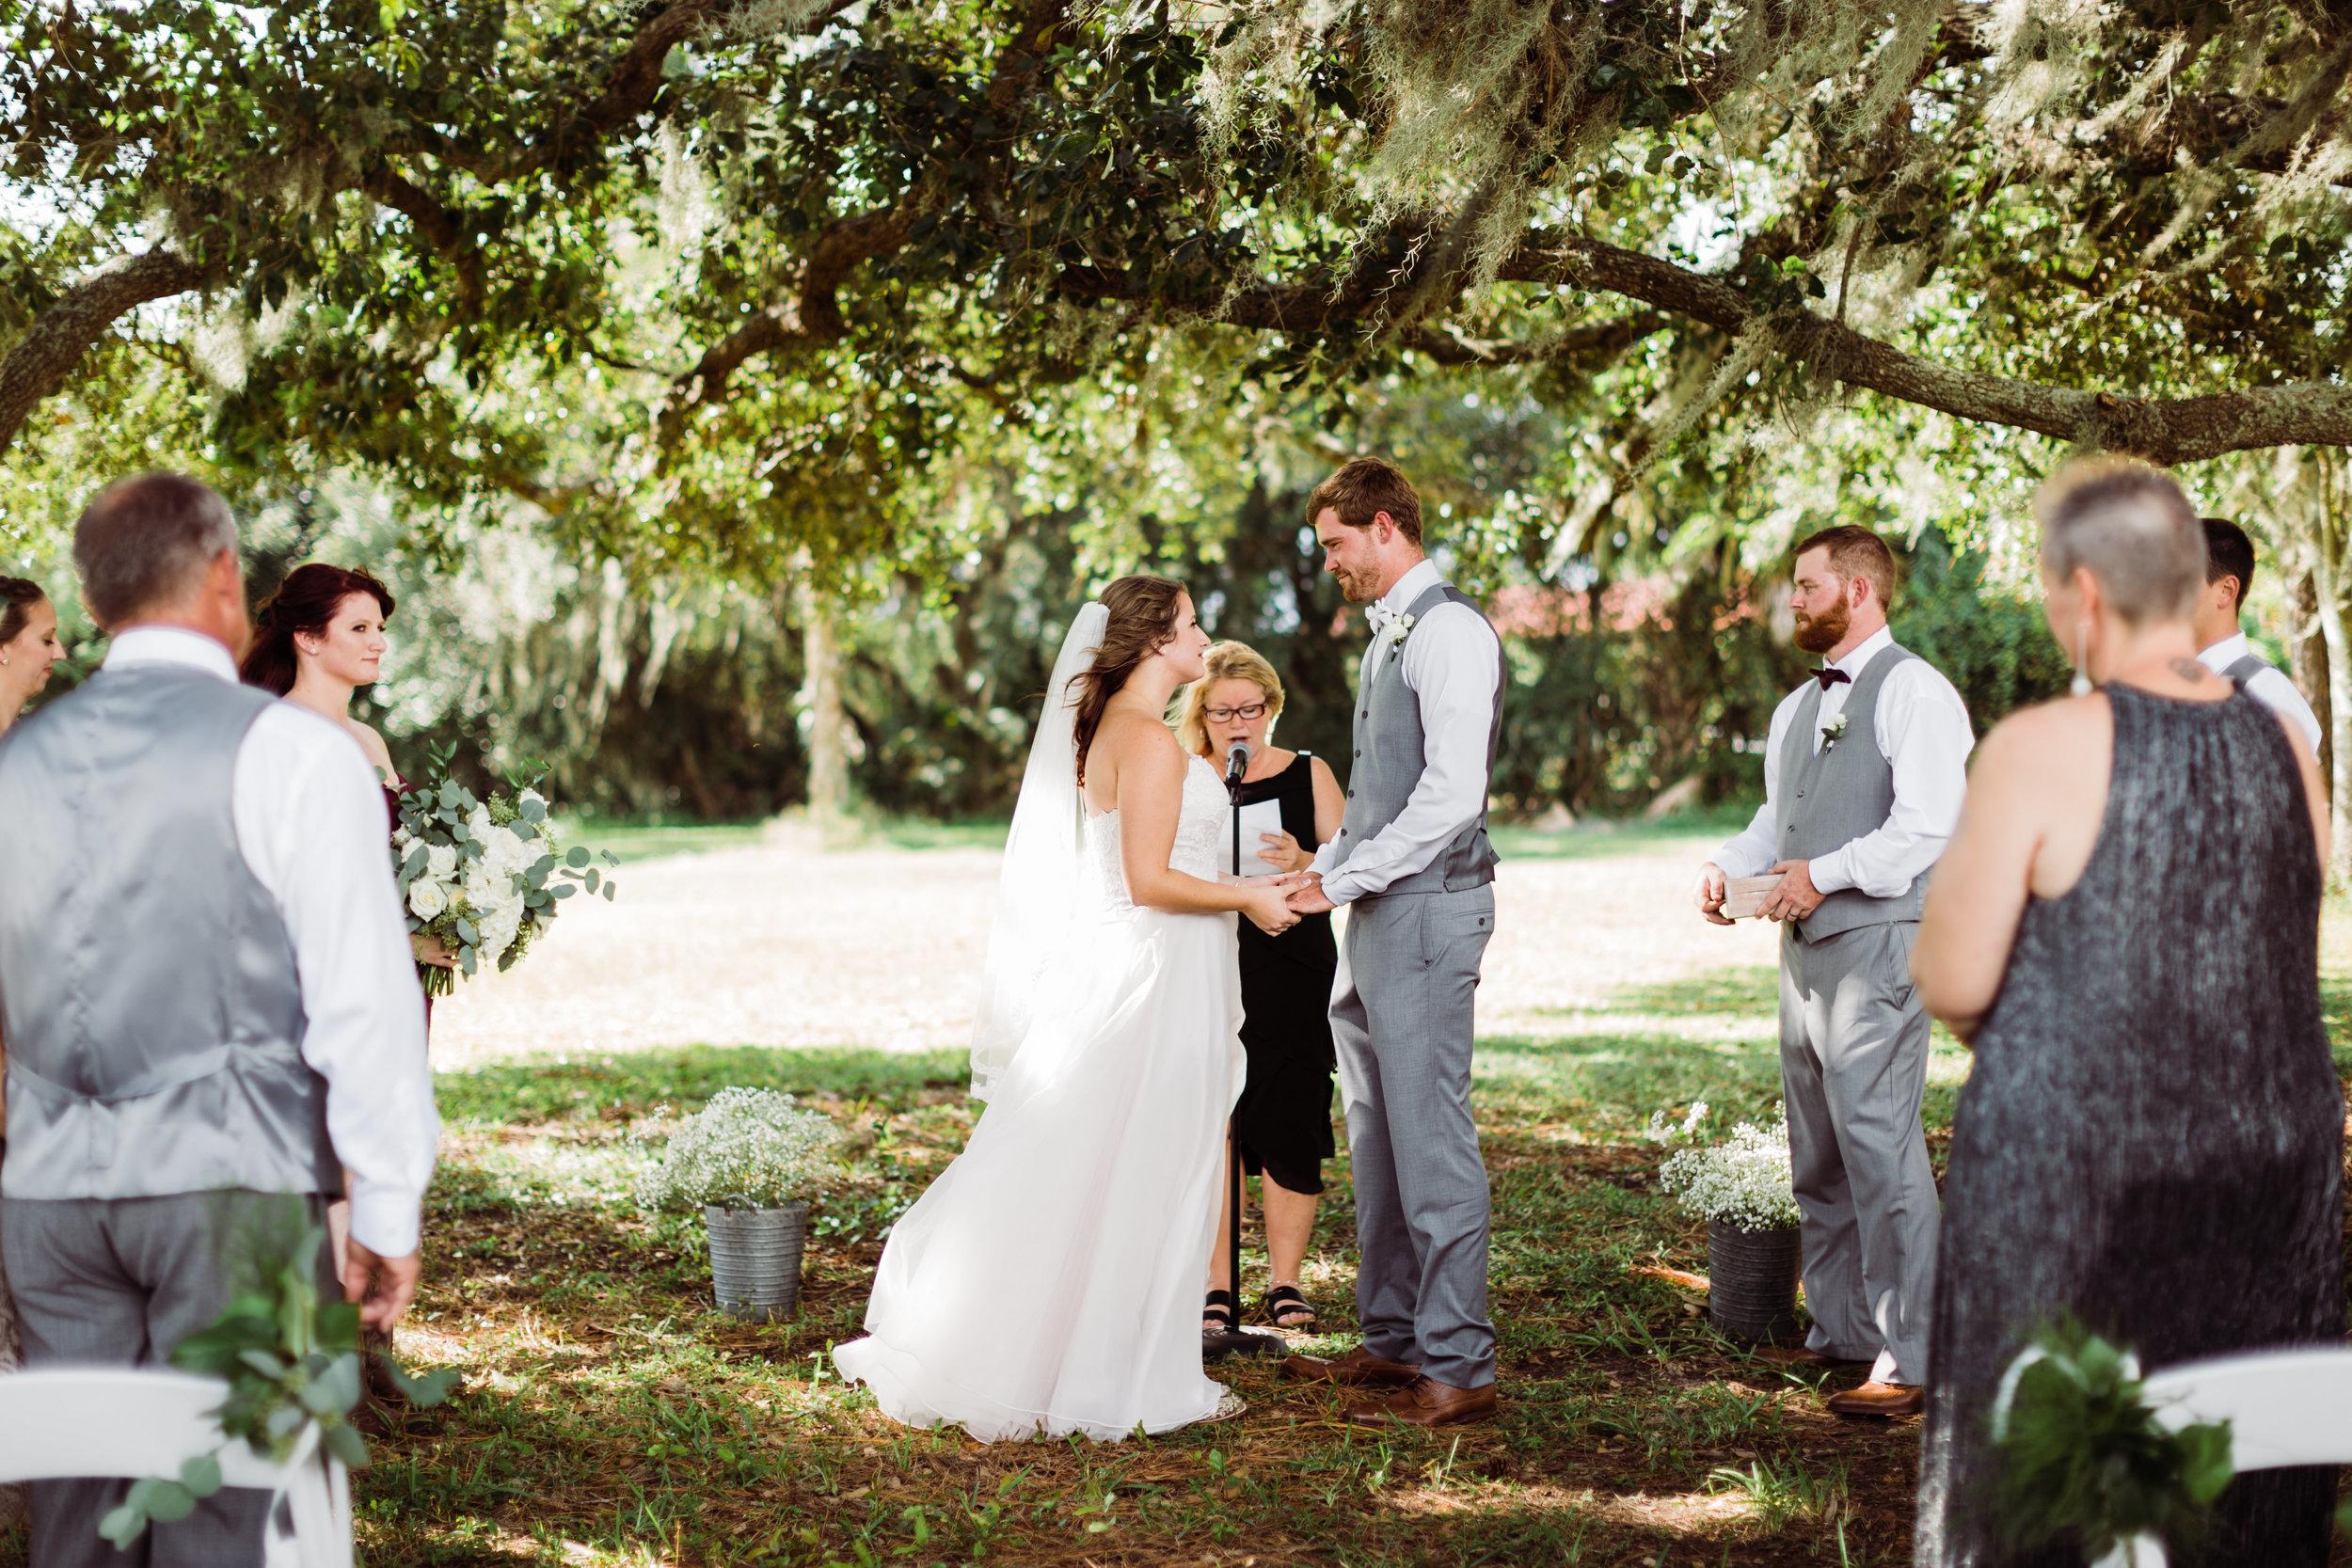 2017.10.14 Samantha and Matthew Crabtree Sarasota Wedding (183 of 708).jpg